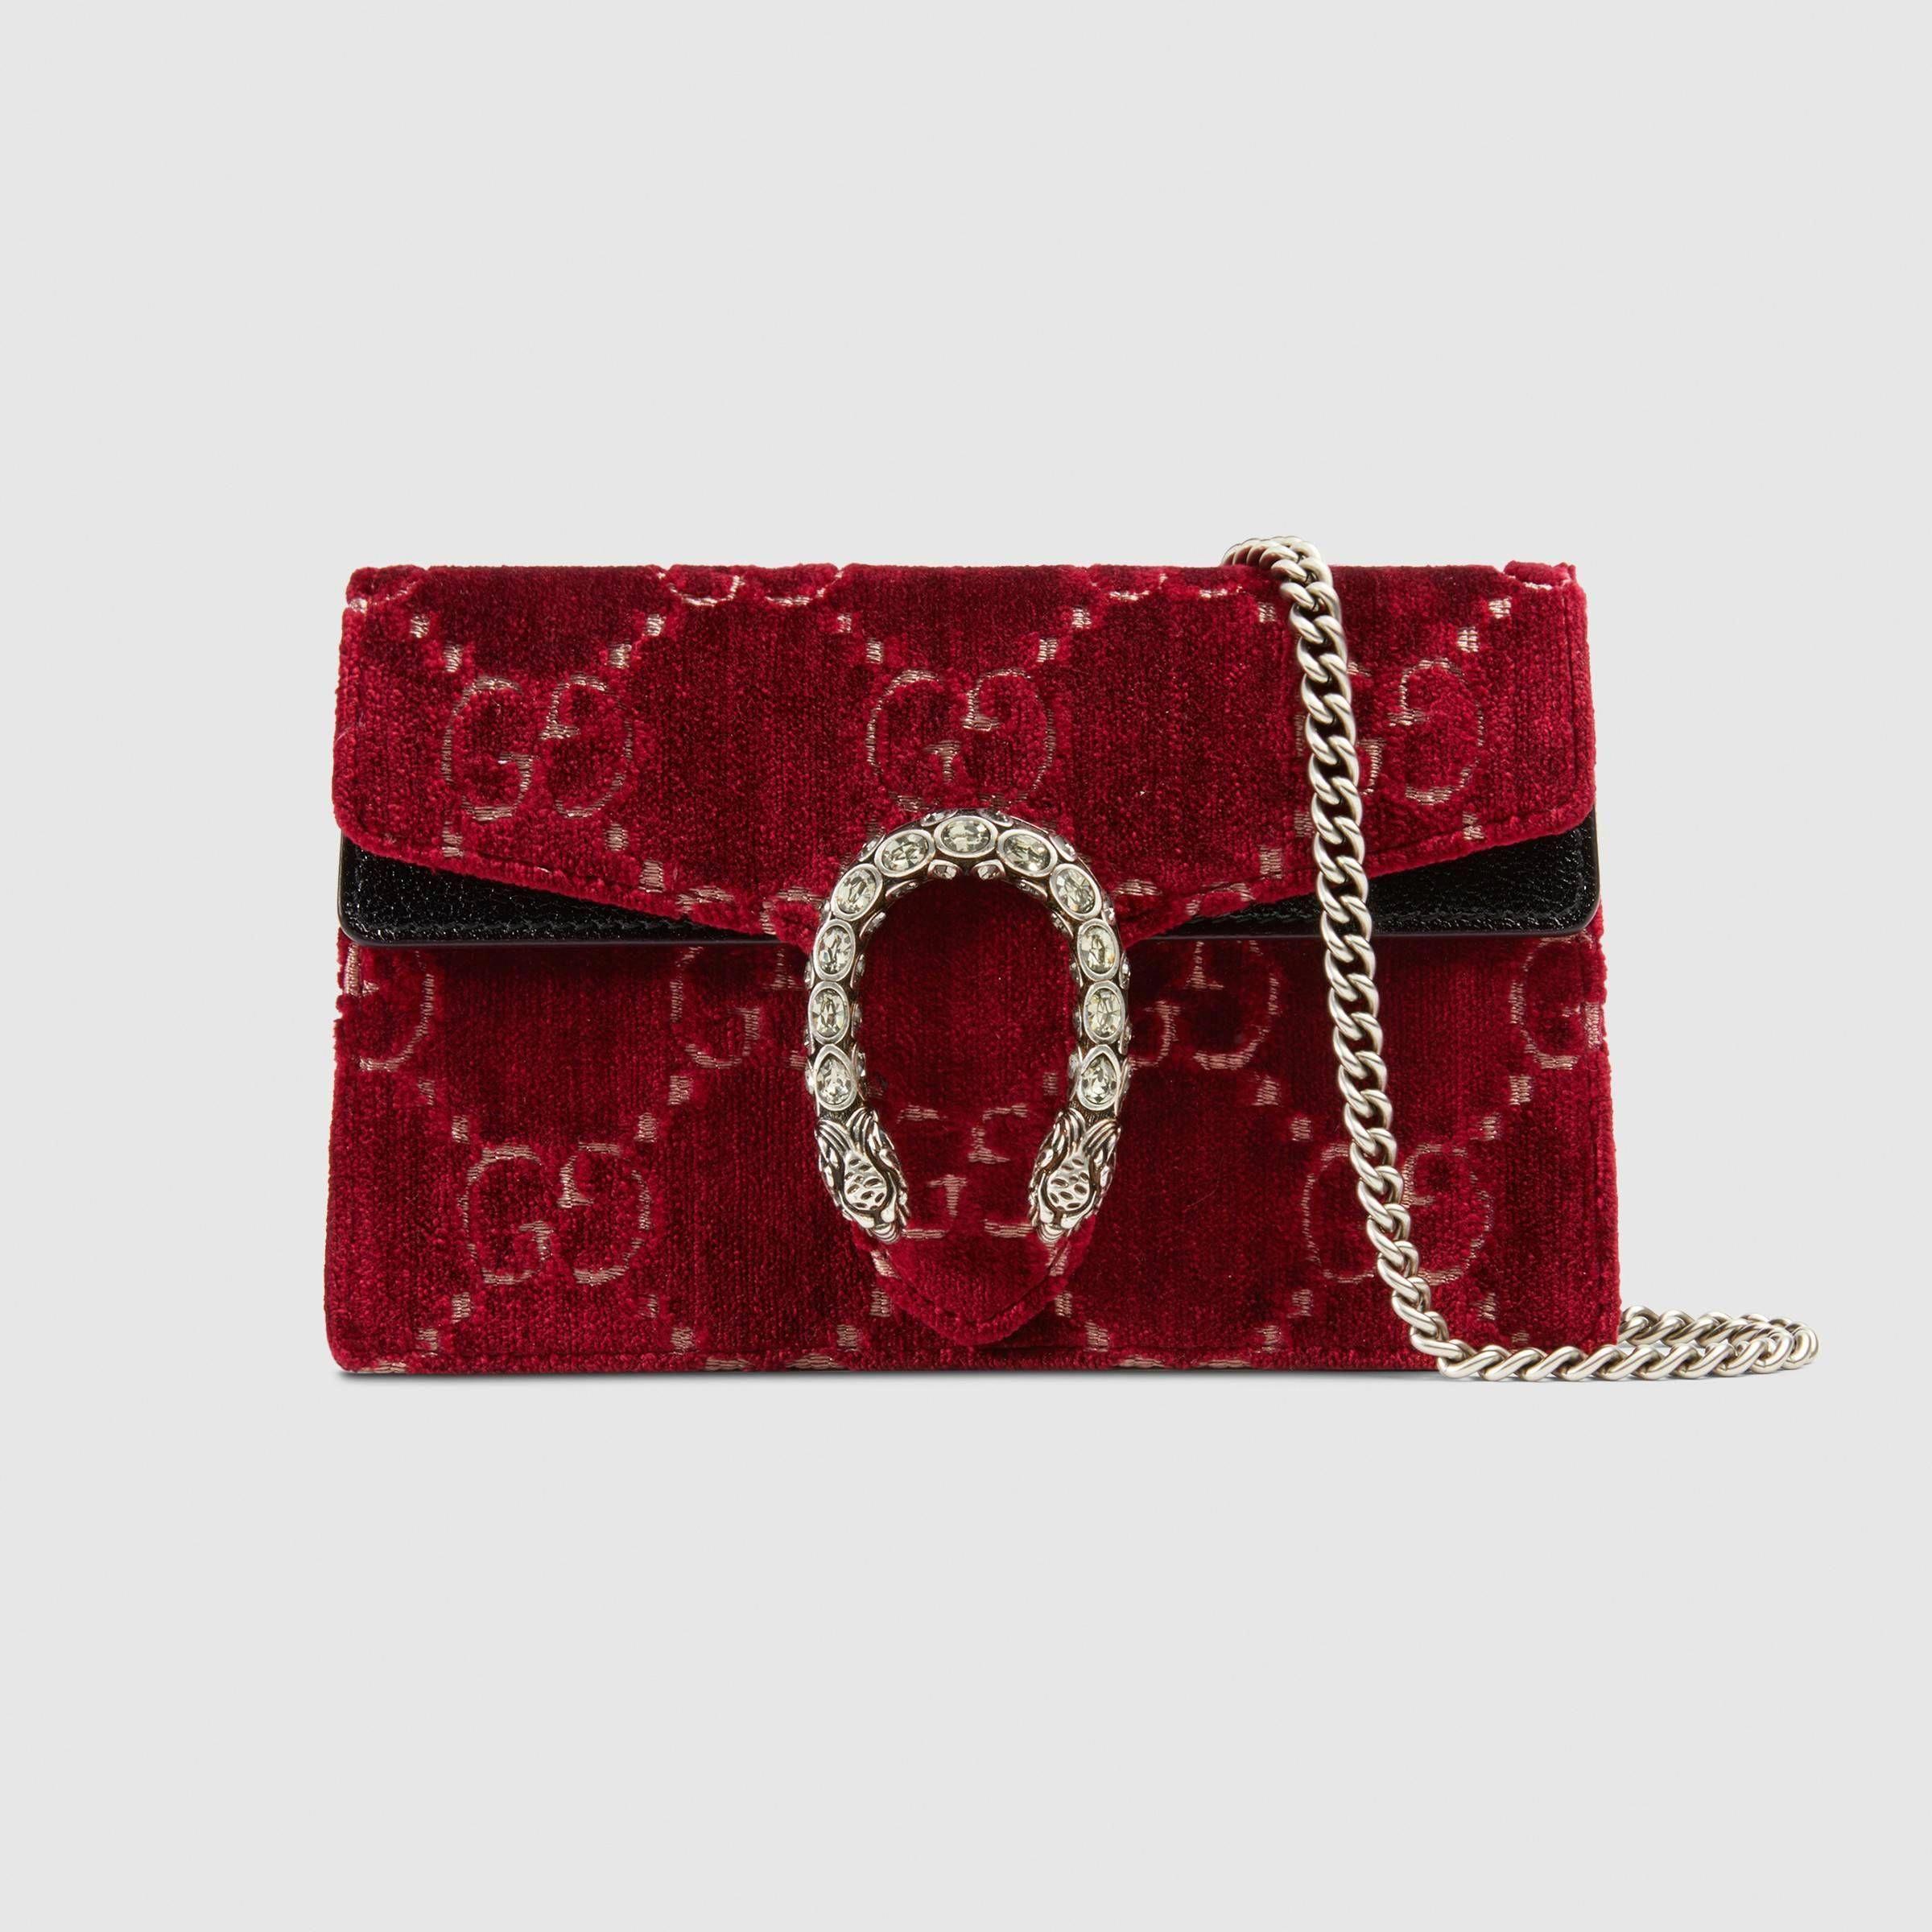 e40d15e5ef22 Dionysus GG velvet super mini bag in Red and beige GG velvet with black patent  leather trim | Gucci Women's Mini Bags #Guccihandbags